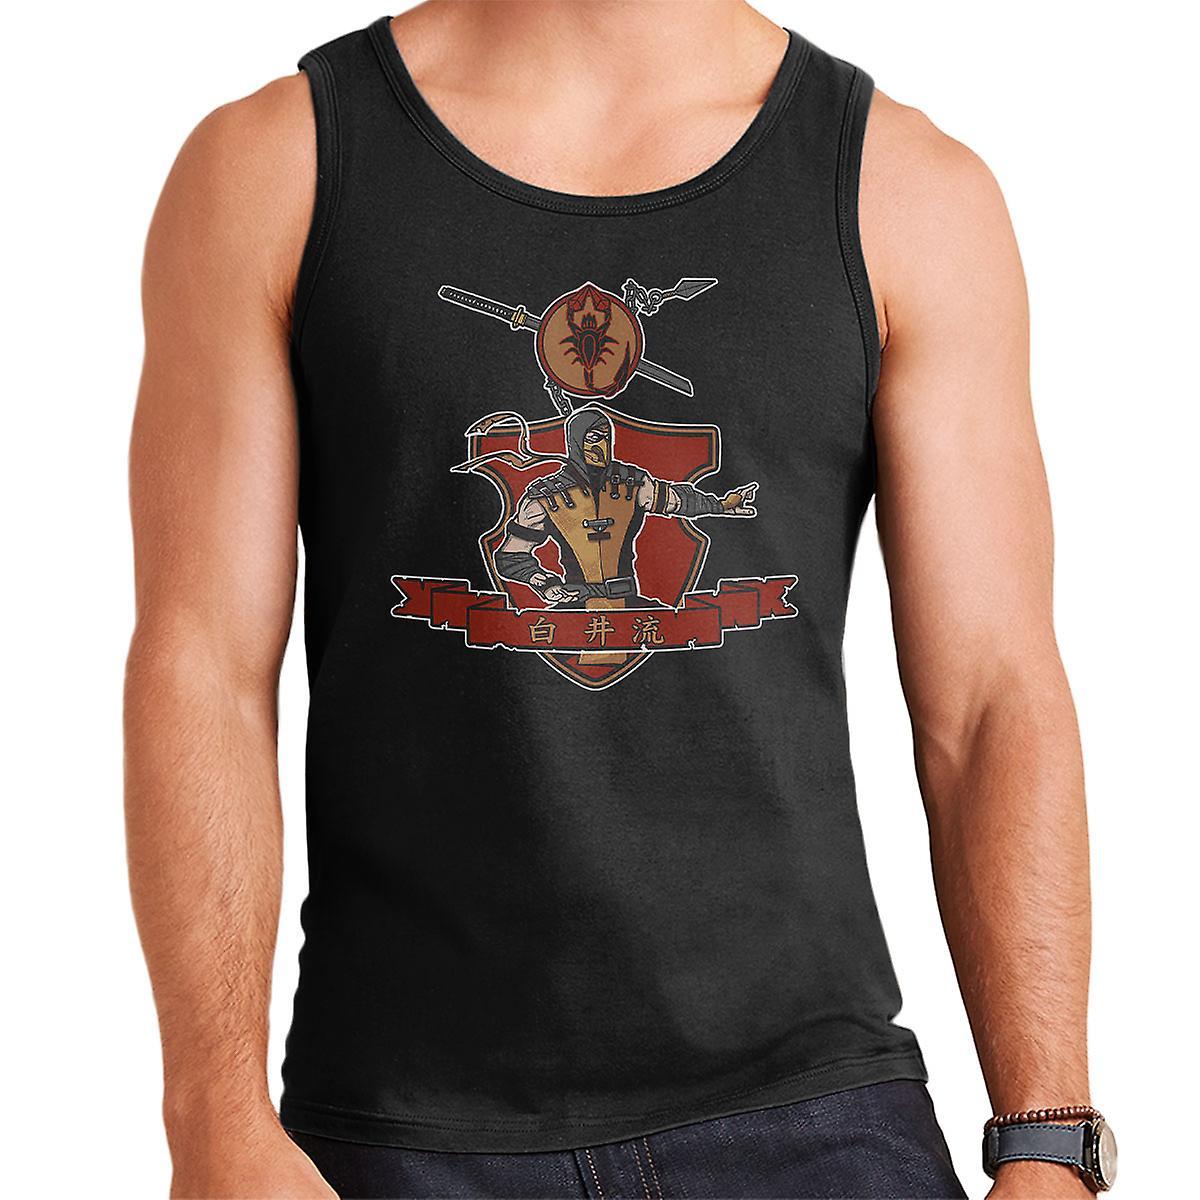 Shirai Ryu Mortal Kombat Men's Vest